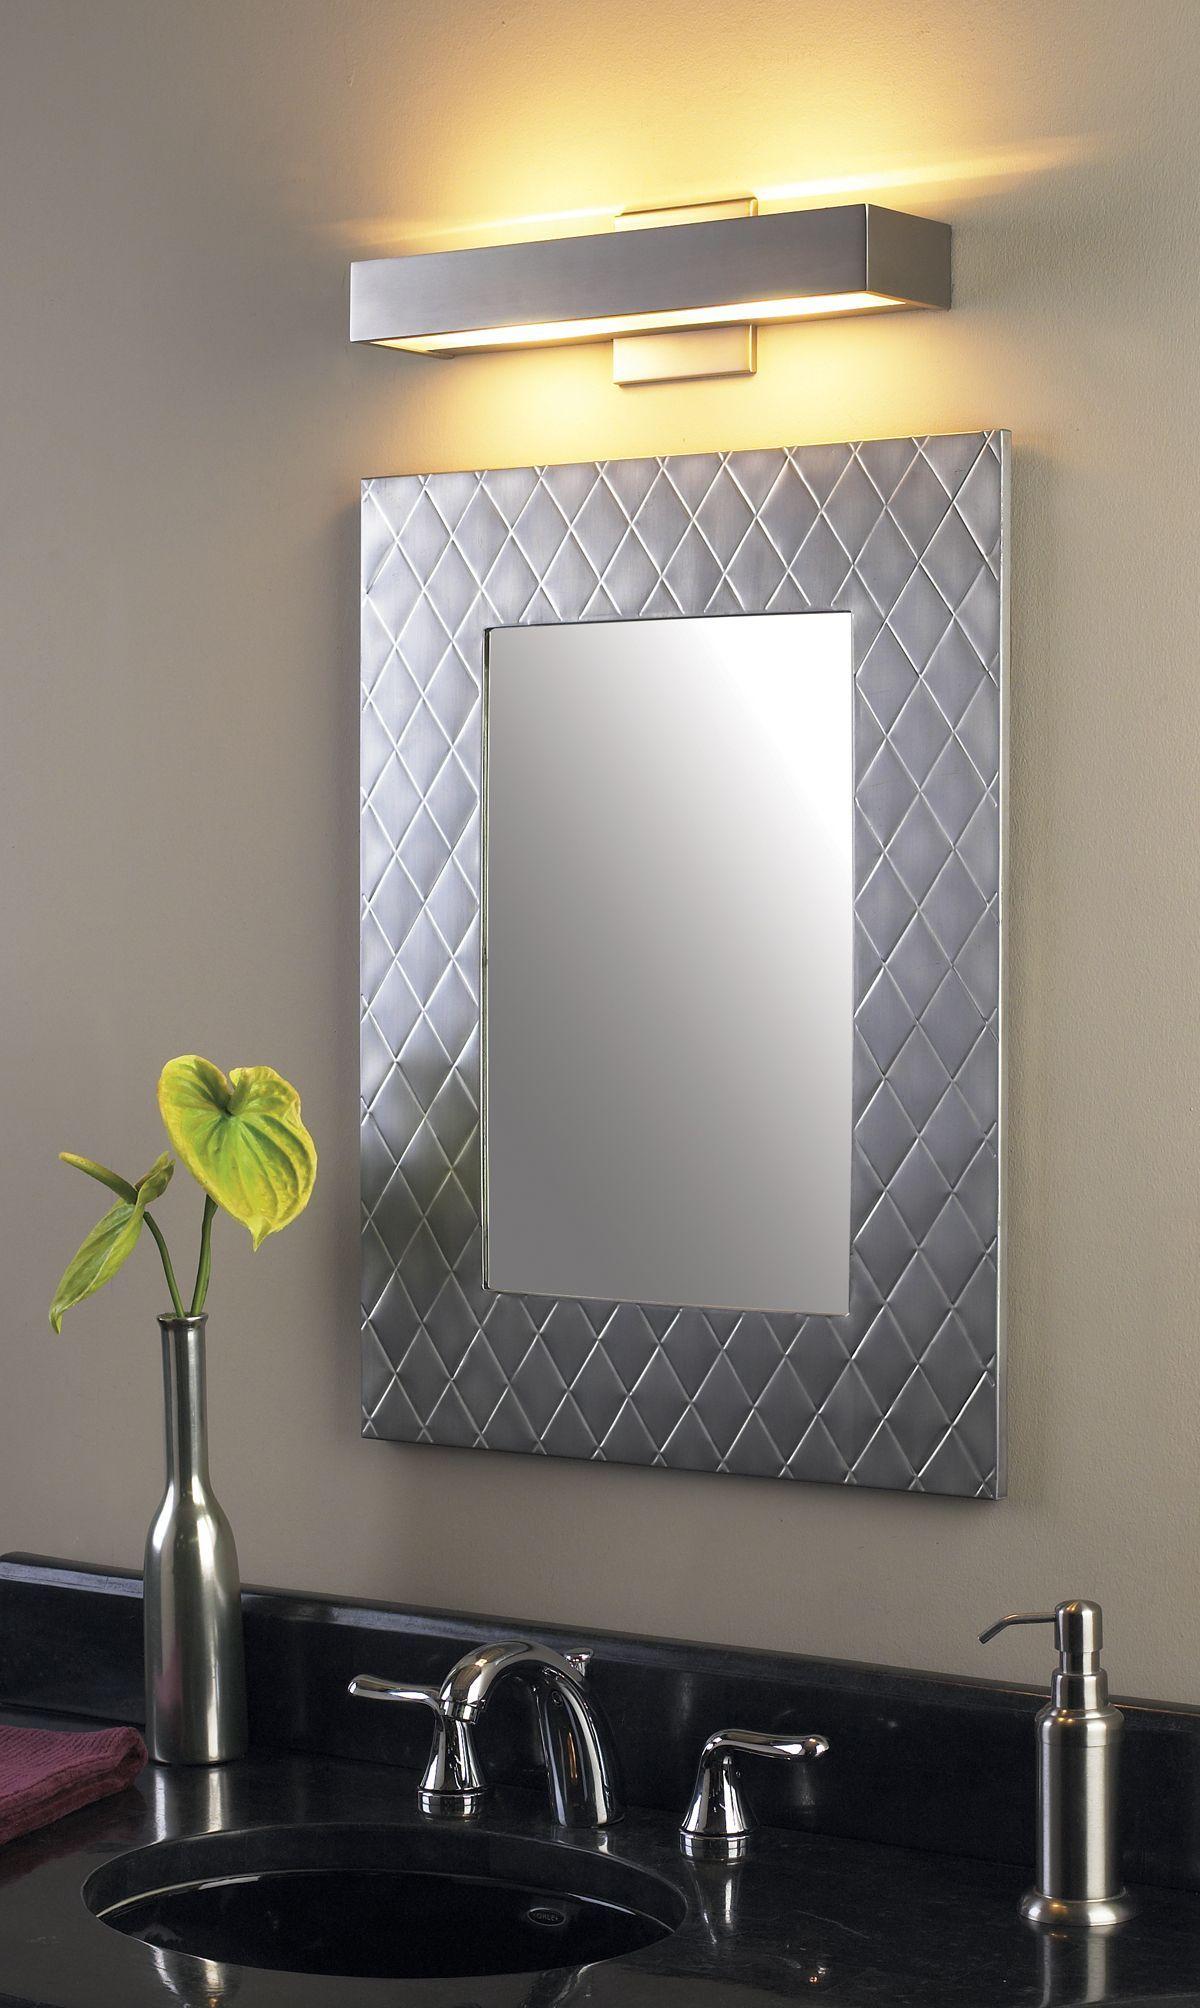 Great Ways To Enhance Your Bathroom A Bathroom Vanity Lighting How To Modern Bathroom Light Fixtures Bathroom Wall Sconces Modern Bathroom Lighting